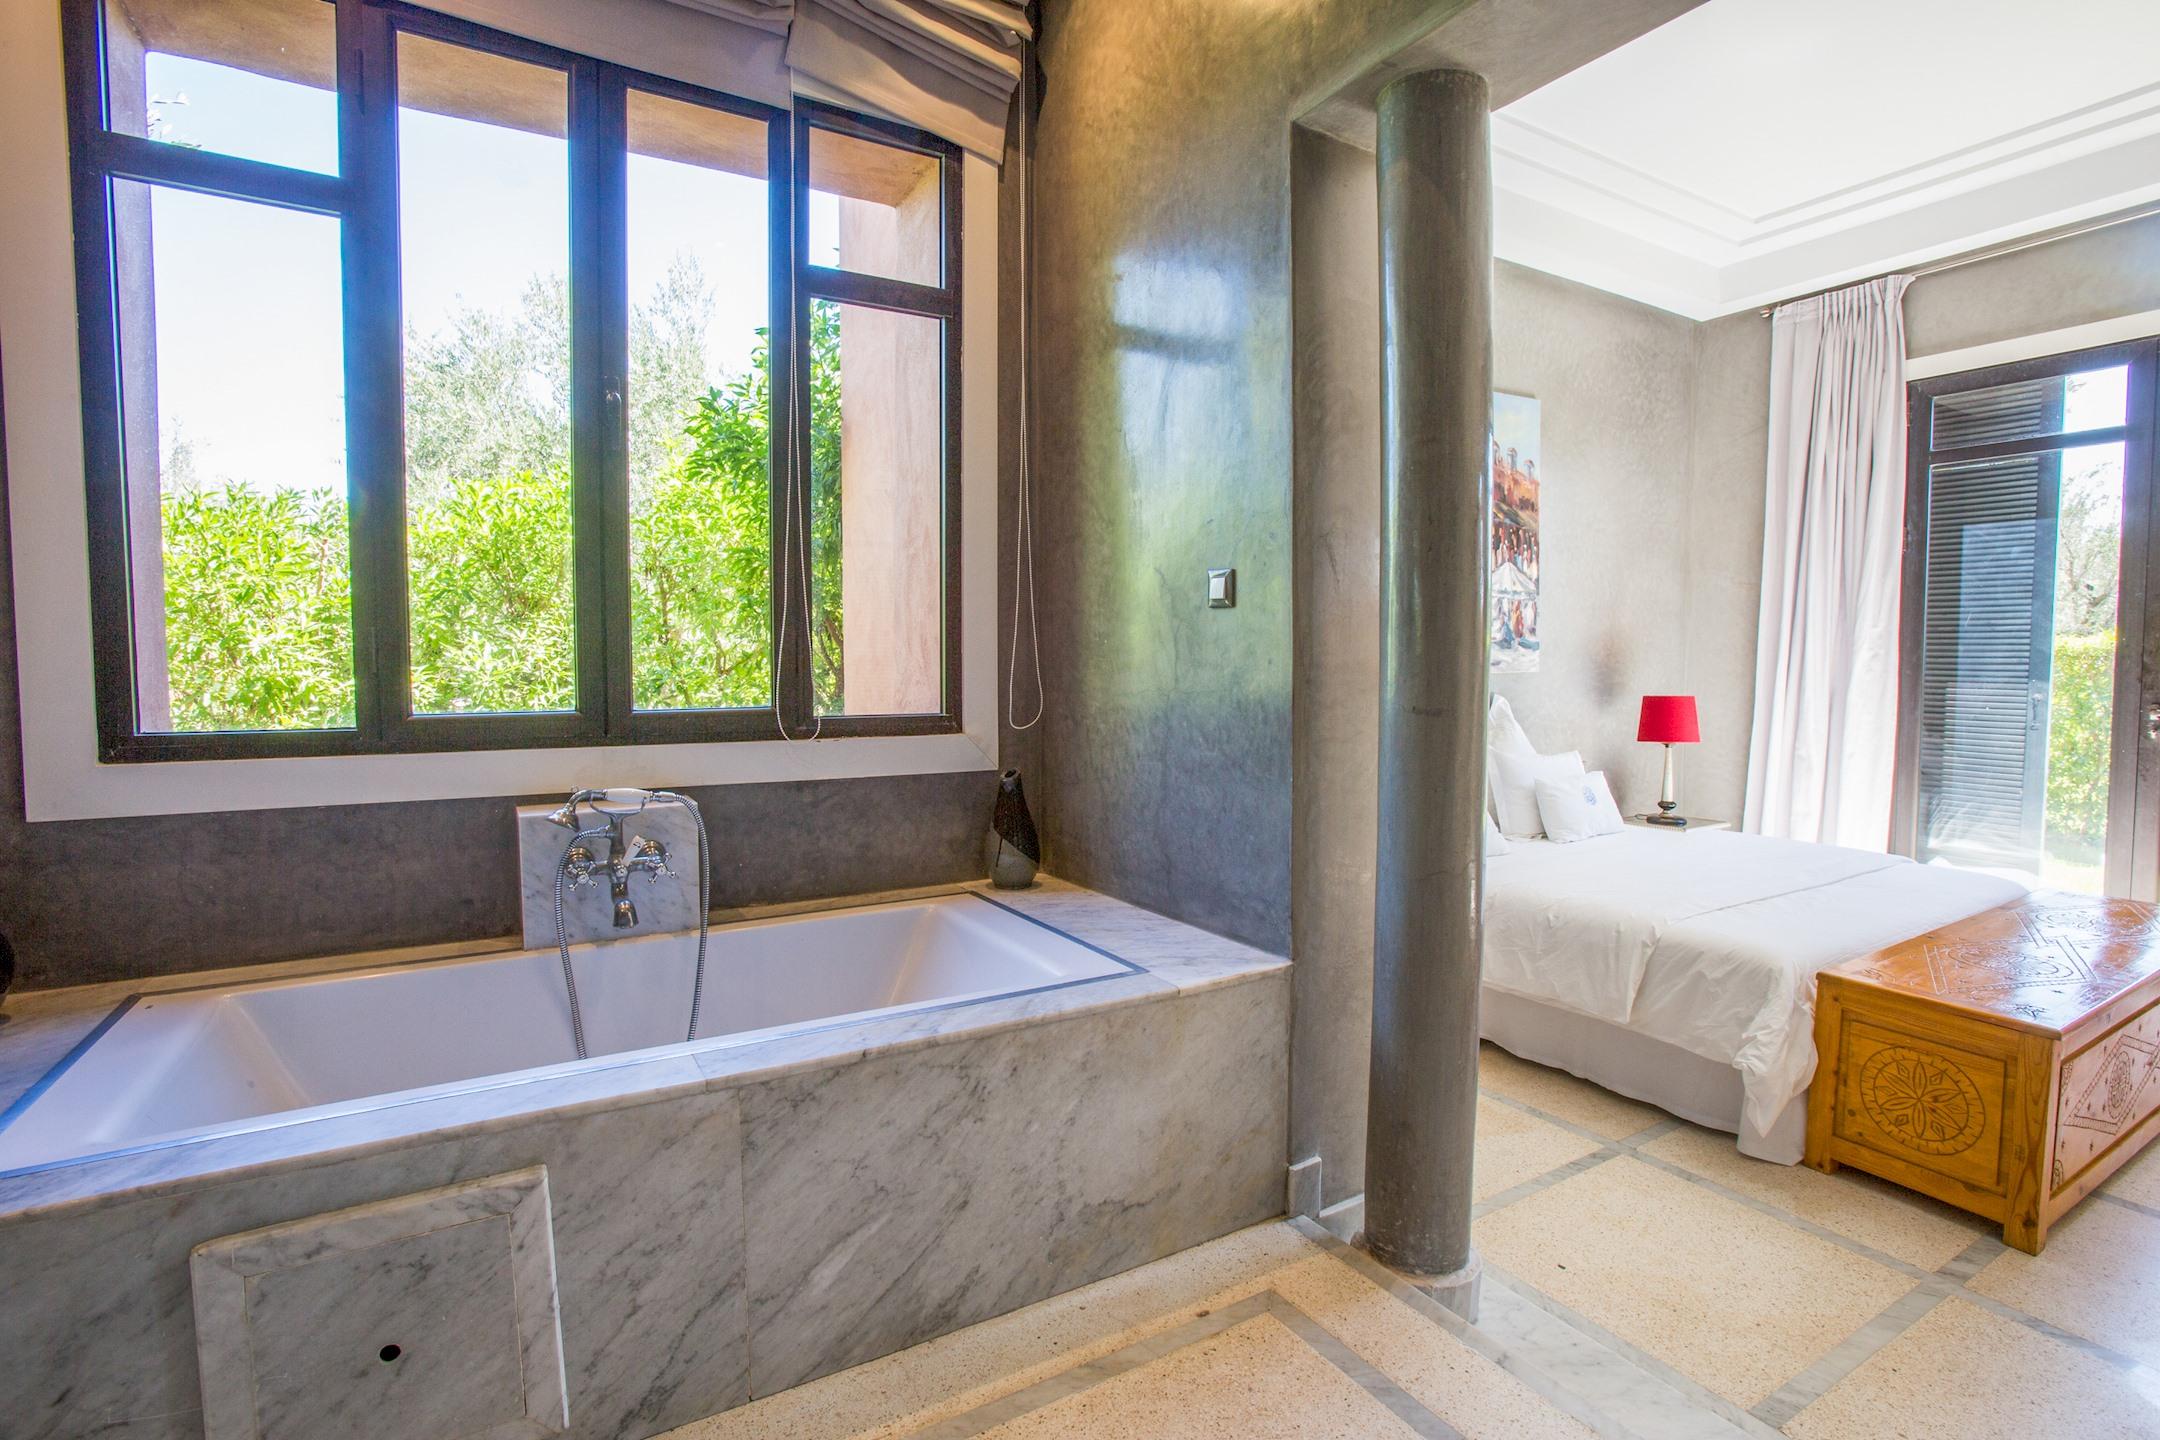 Apartment VILLA KOUTOUBIA - PISCINE CHAUFFEE  HAMMAM  JACUZZI  PETIT-DEJEUNER A MARRAKECH photo 20159665